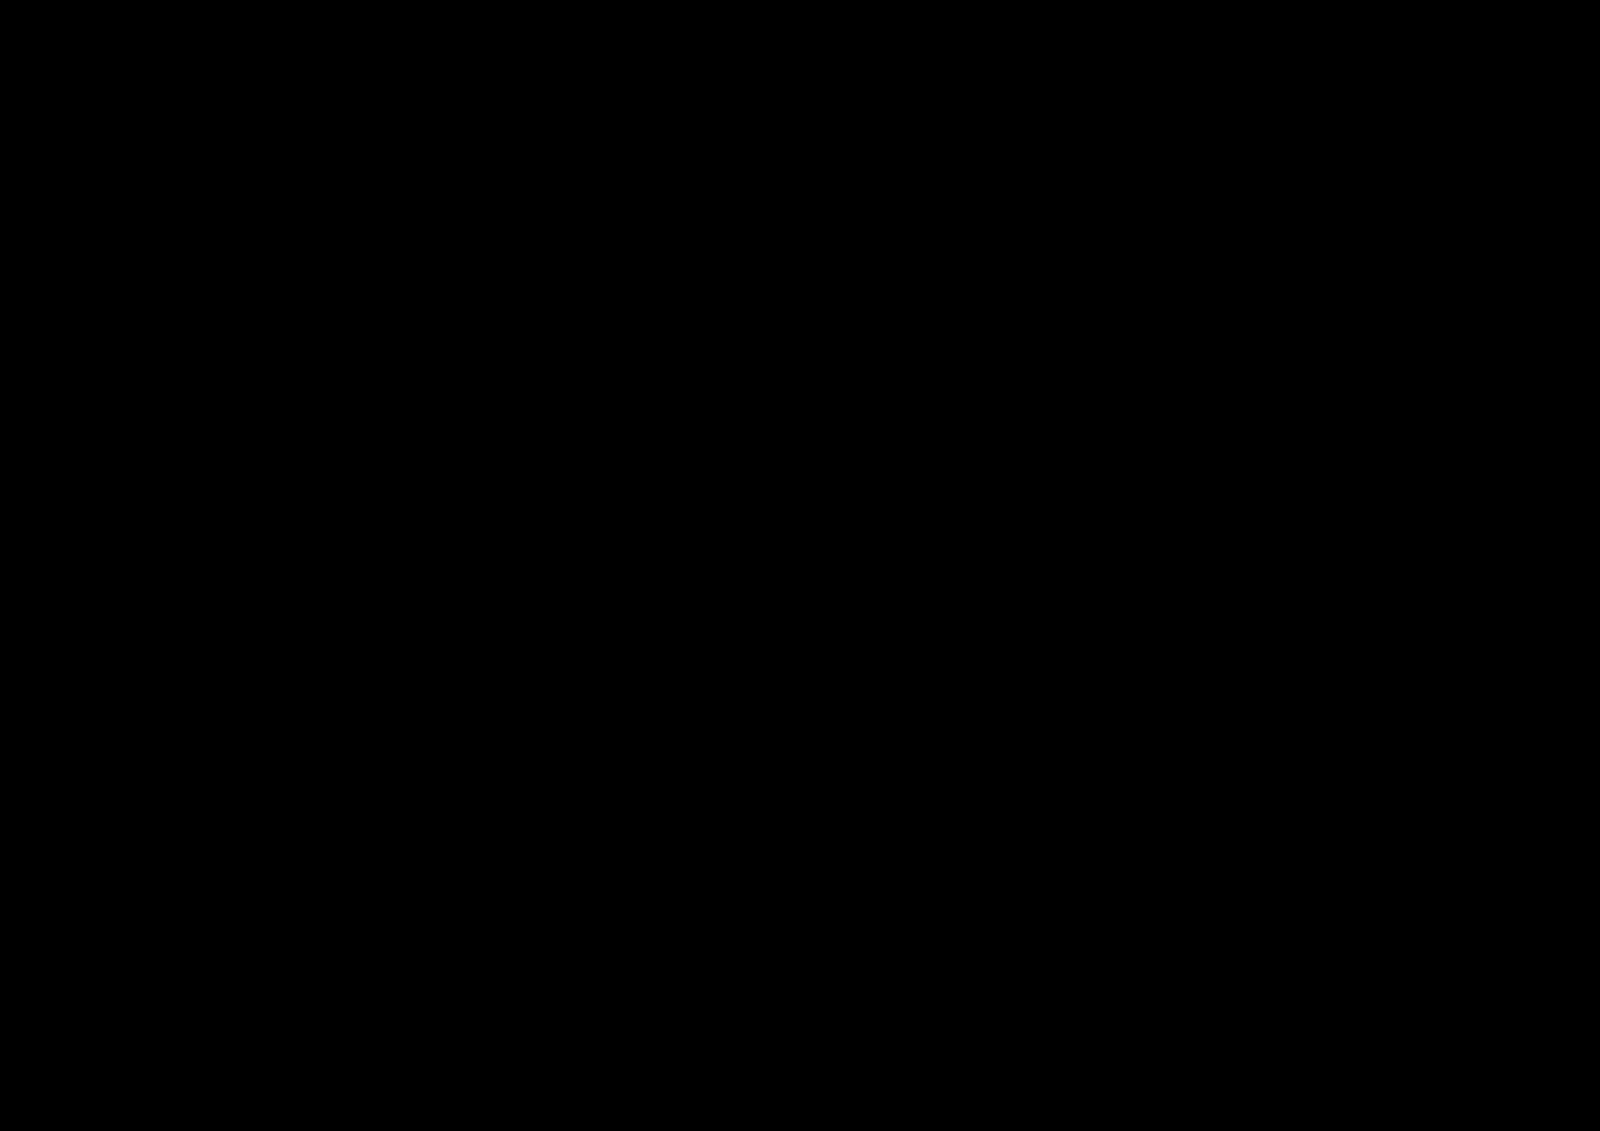 Tubepartitura para elisa de beethoven partitura para for Musica clasica para entrenar